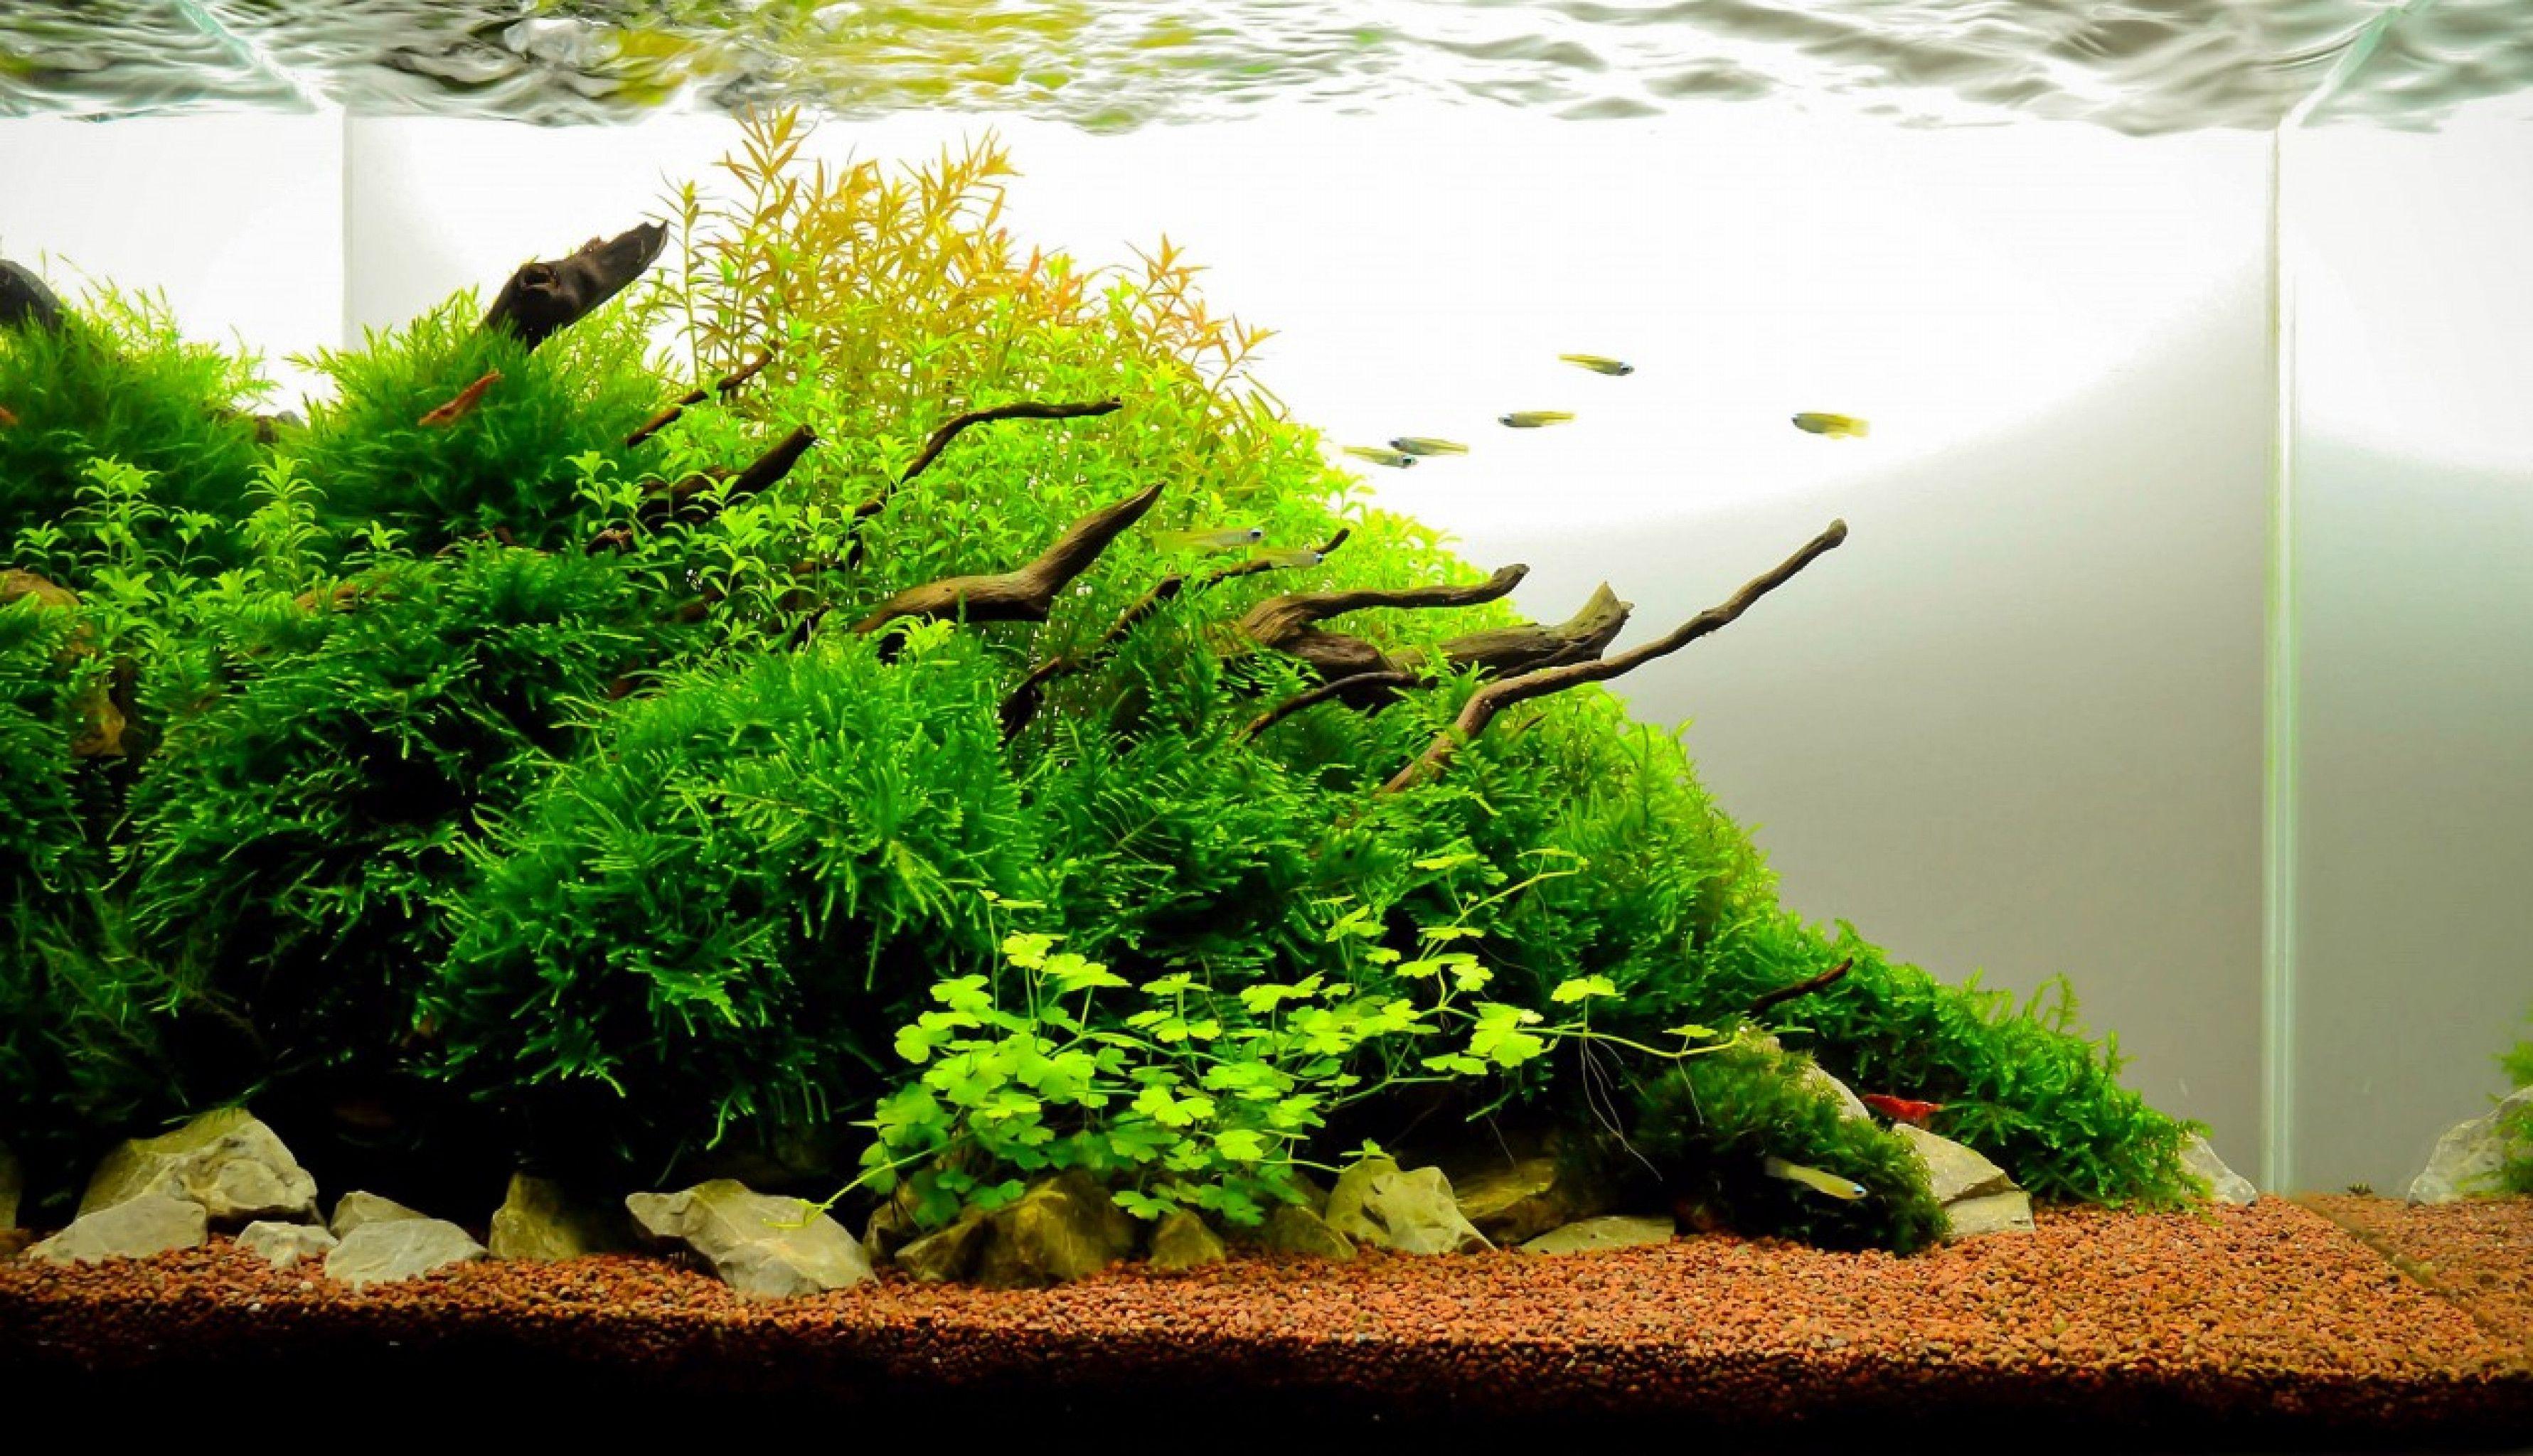 Image Result For 10 Gallon Aquascape Aquascape Planted Aquarium Aquascape Aquarium